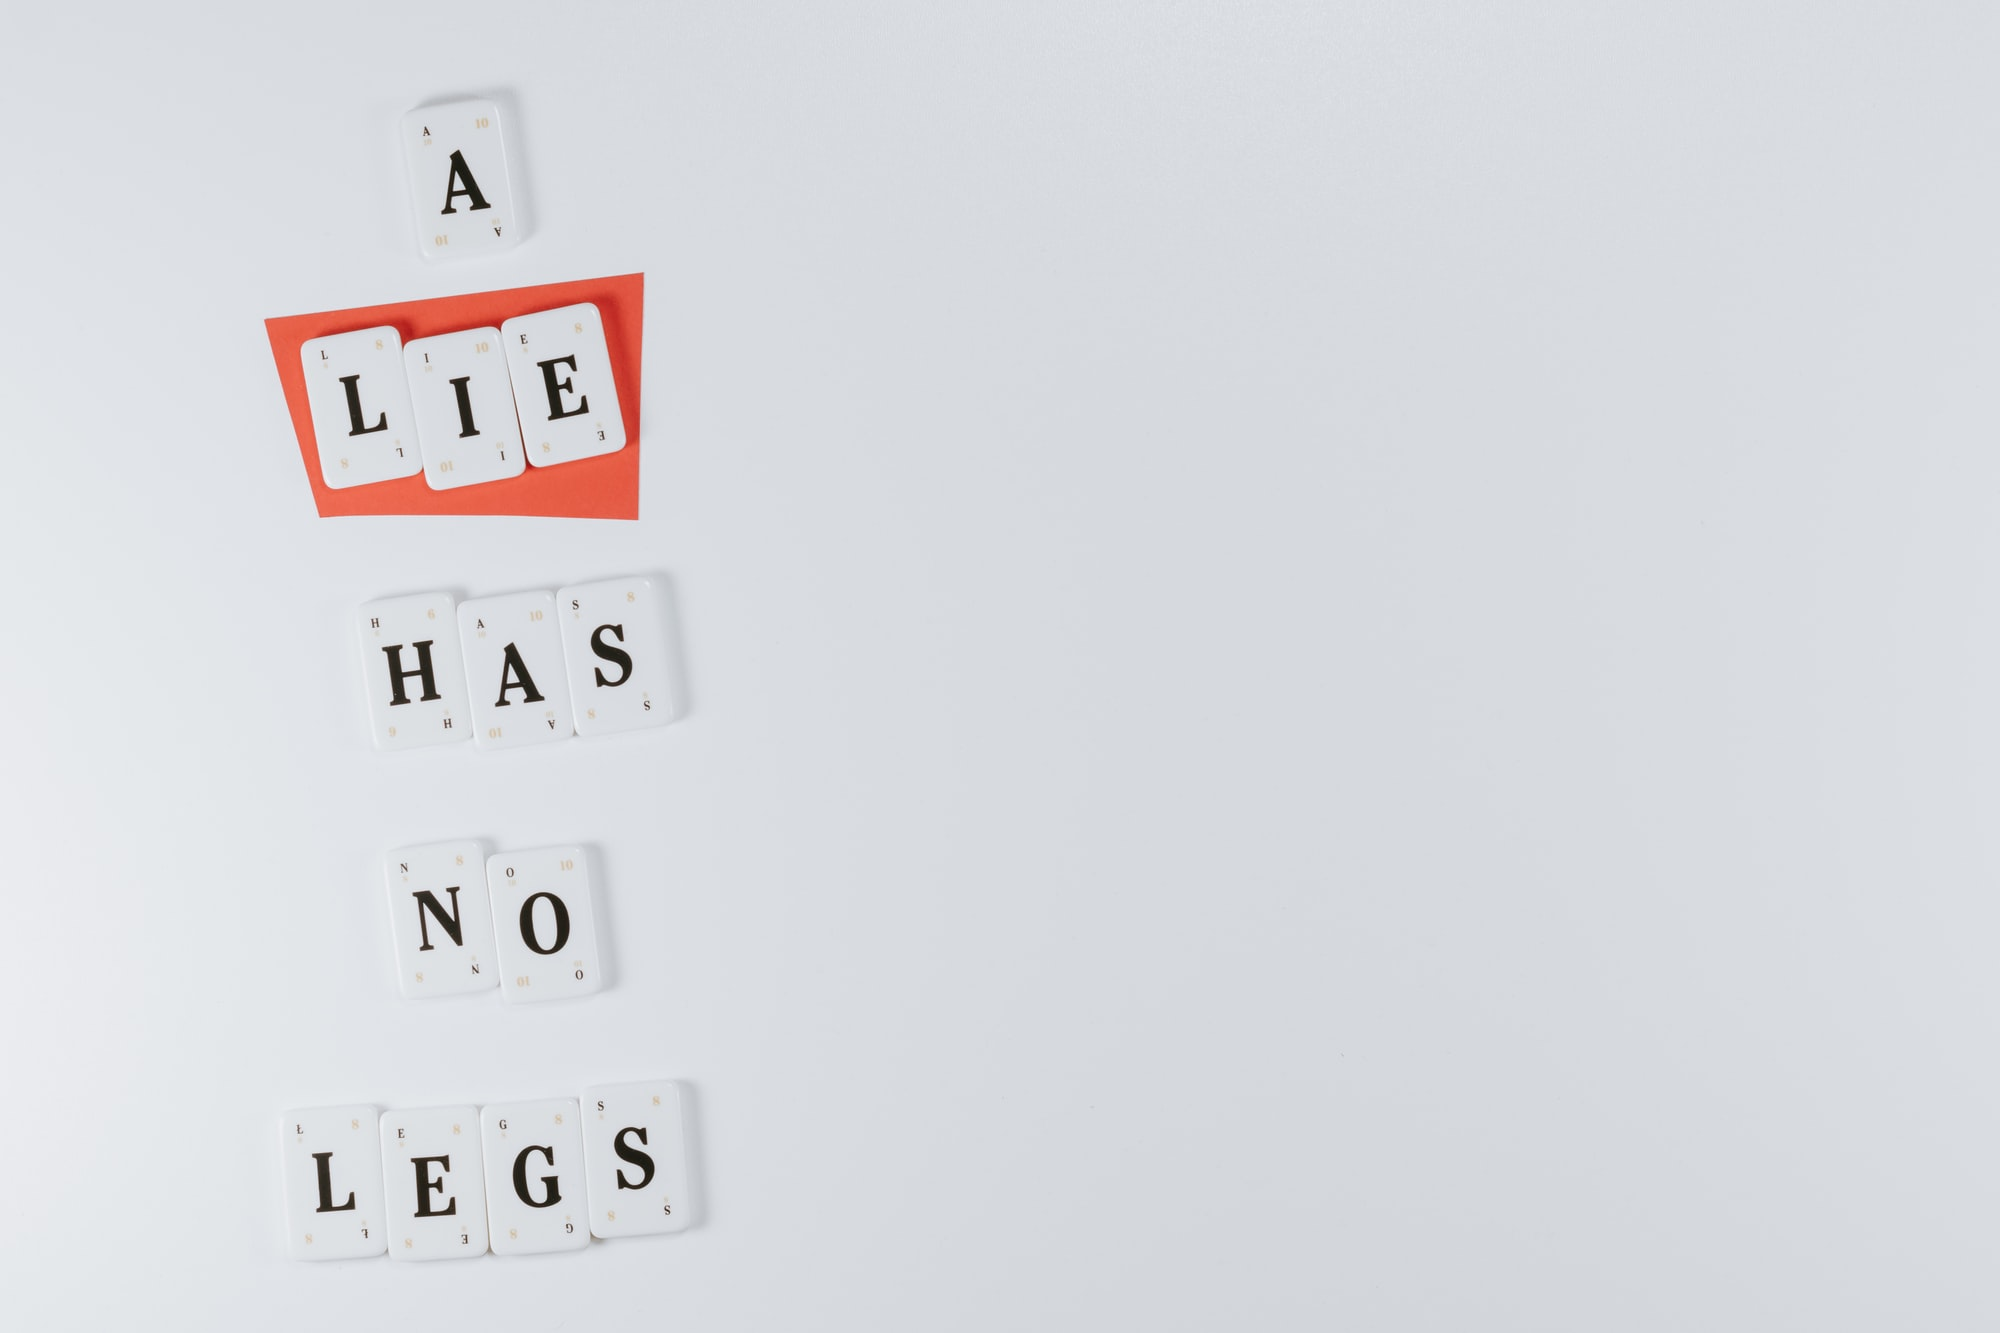 Pathological & Compulsive Liars